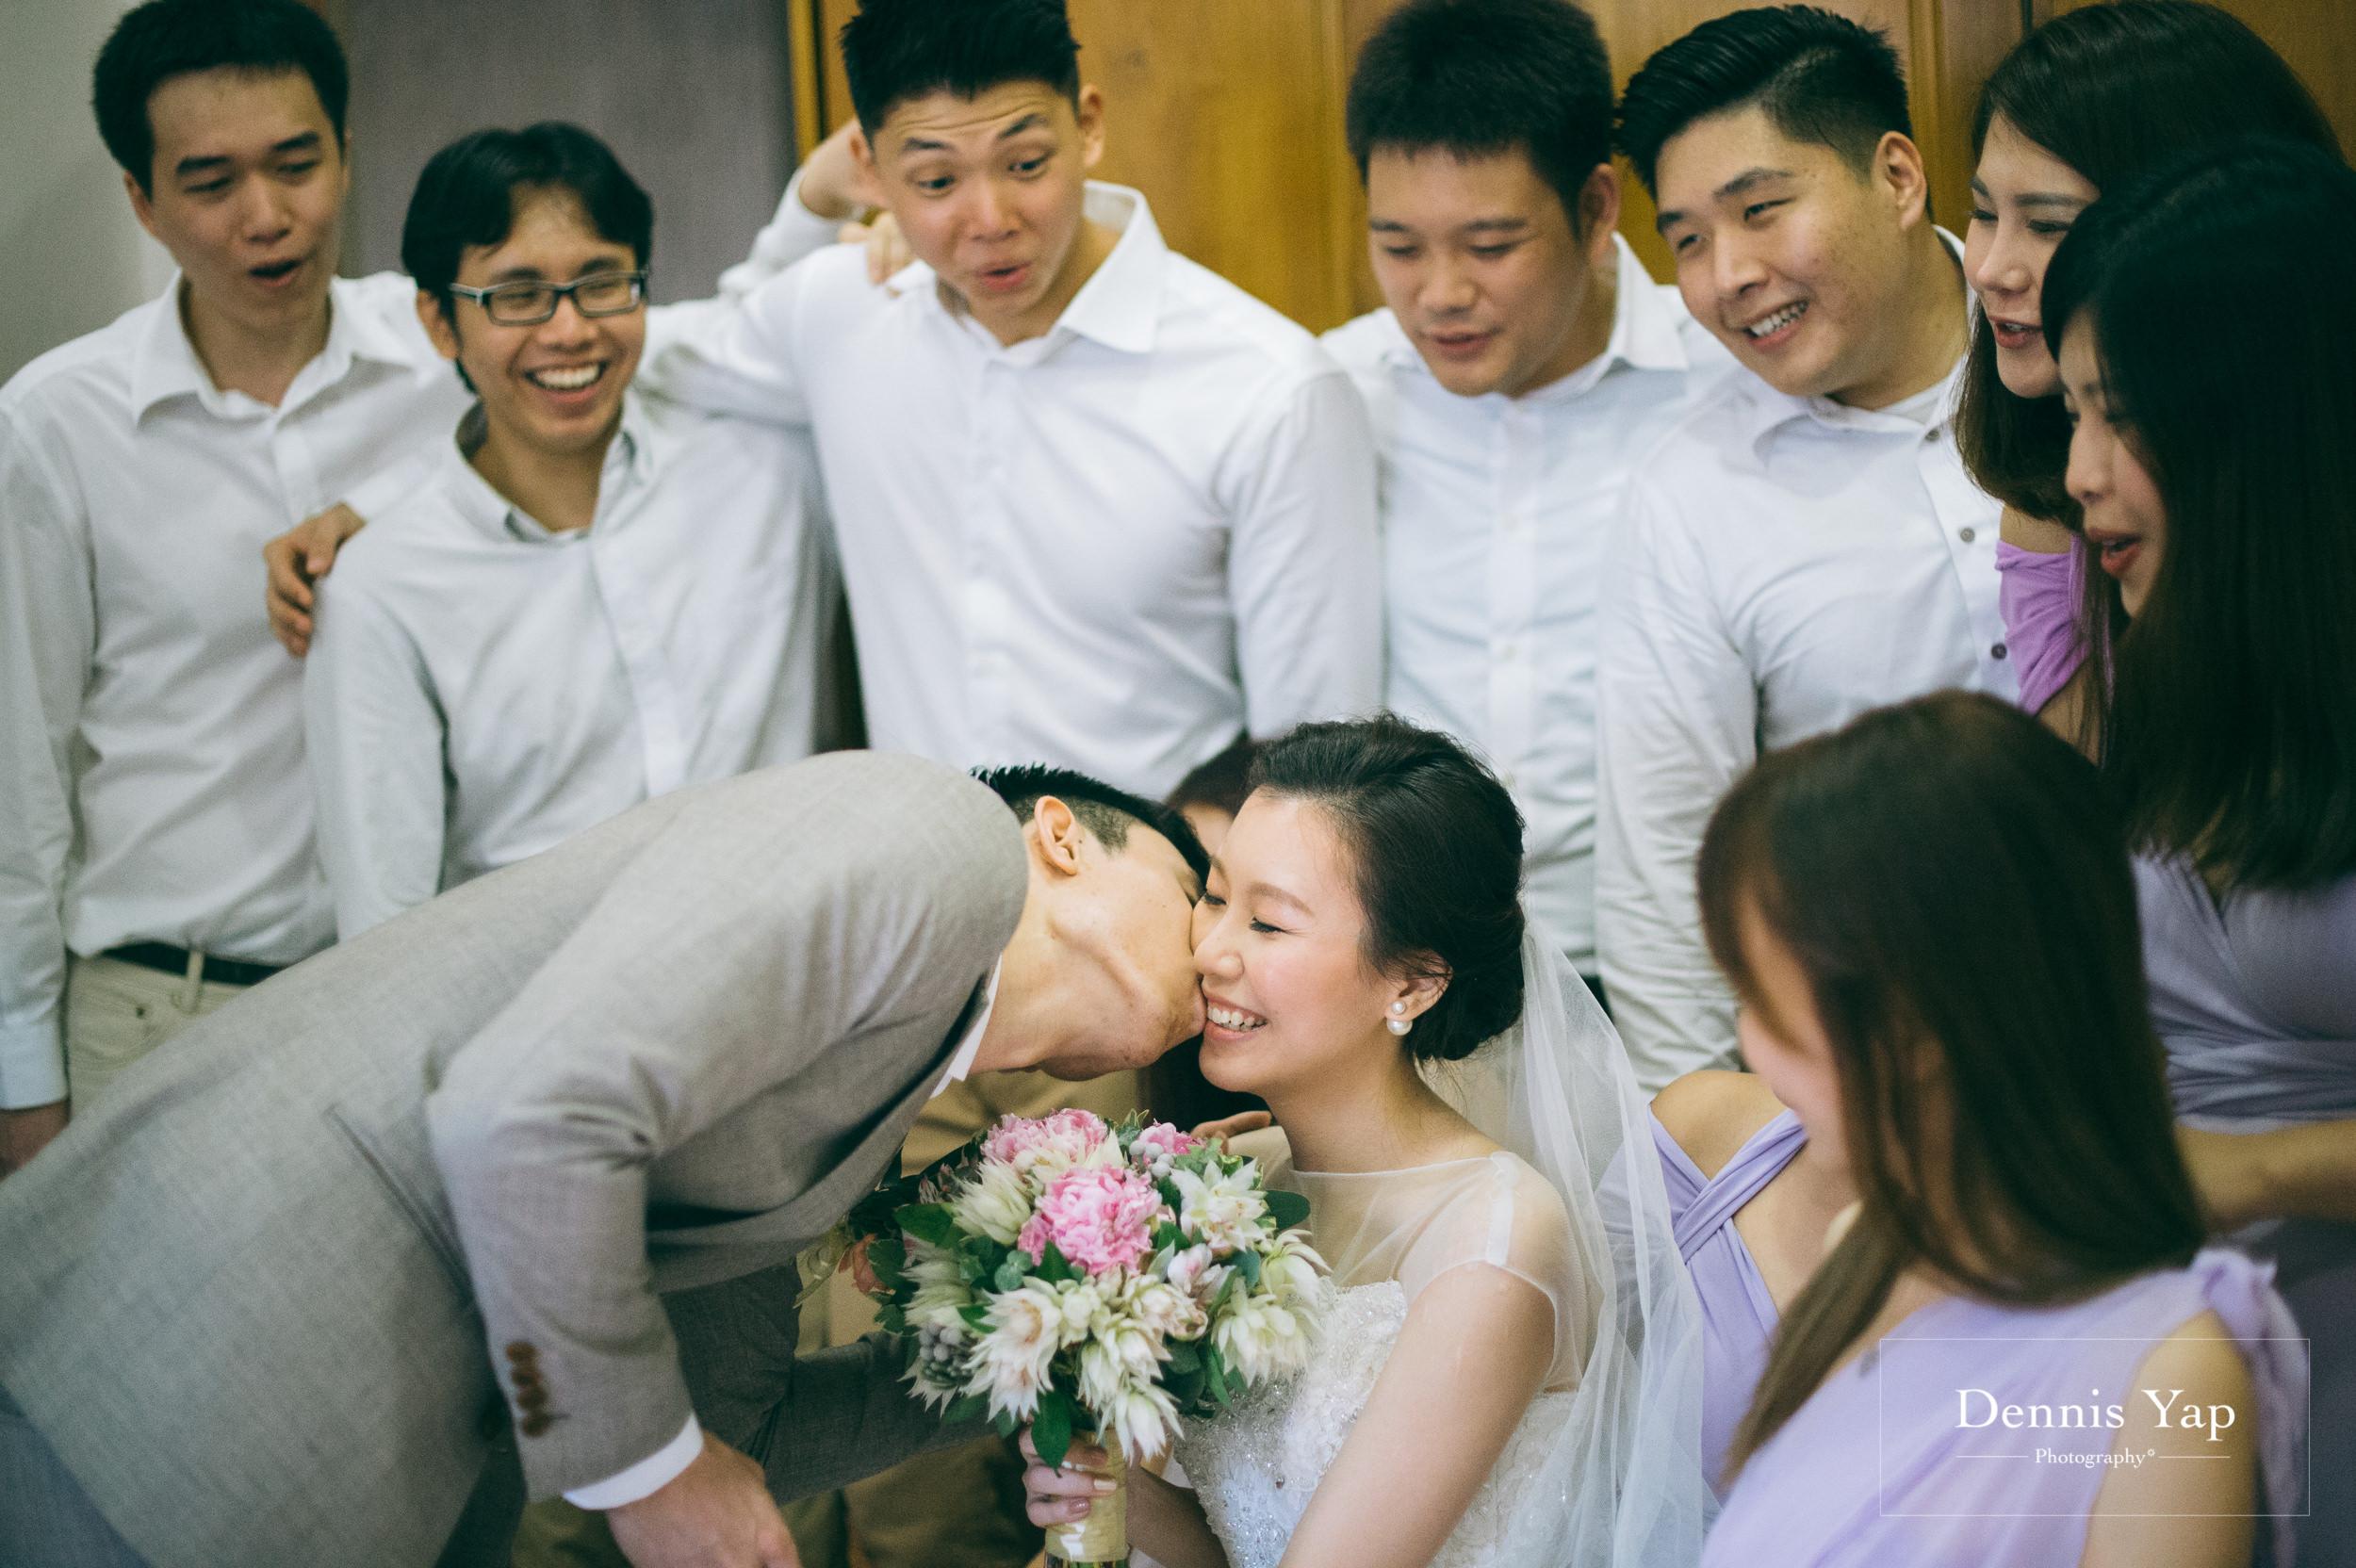 danny sherine wedding day group photo dennis yap photography usj heights malaysia top wedding photographer-10.jpg